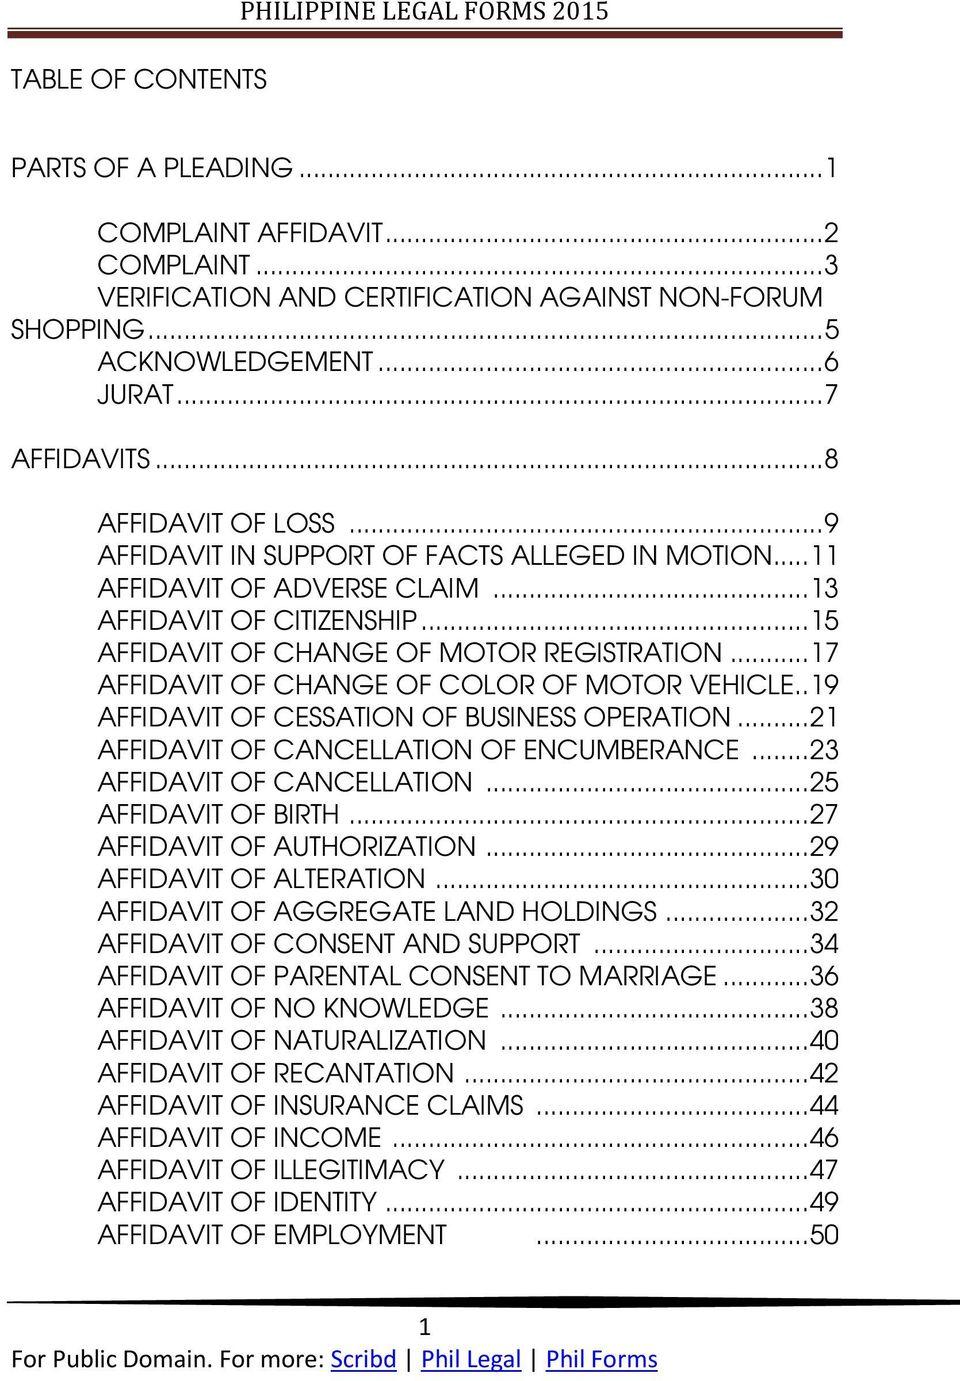 Legal Forms Philippines Affidavit Of Undertaking